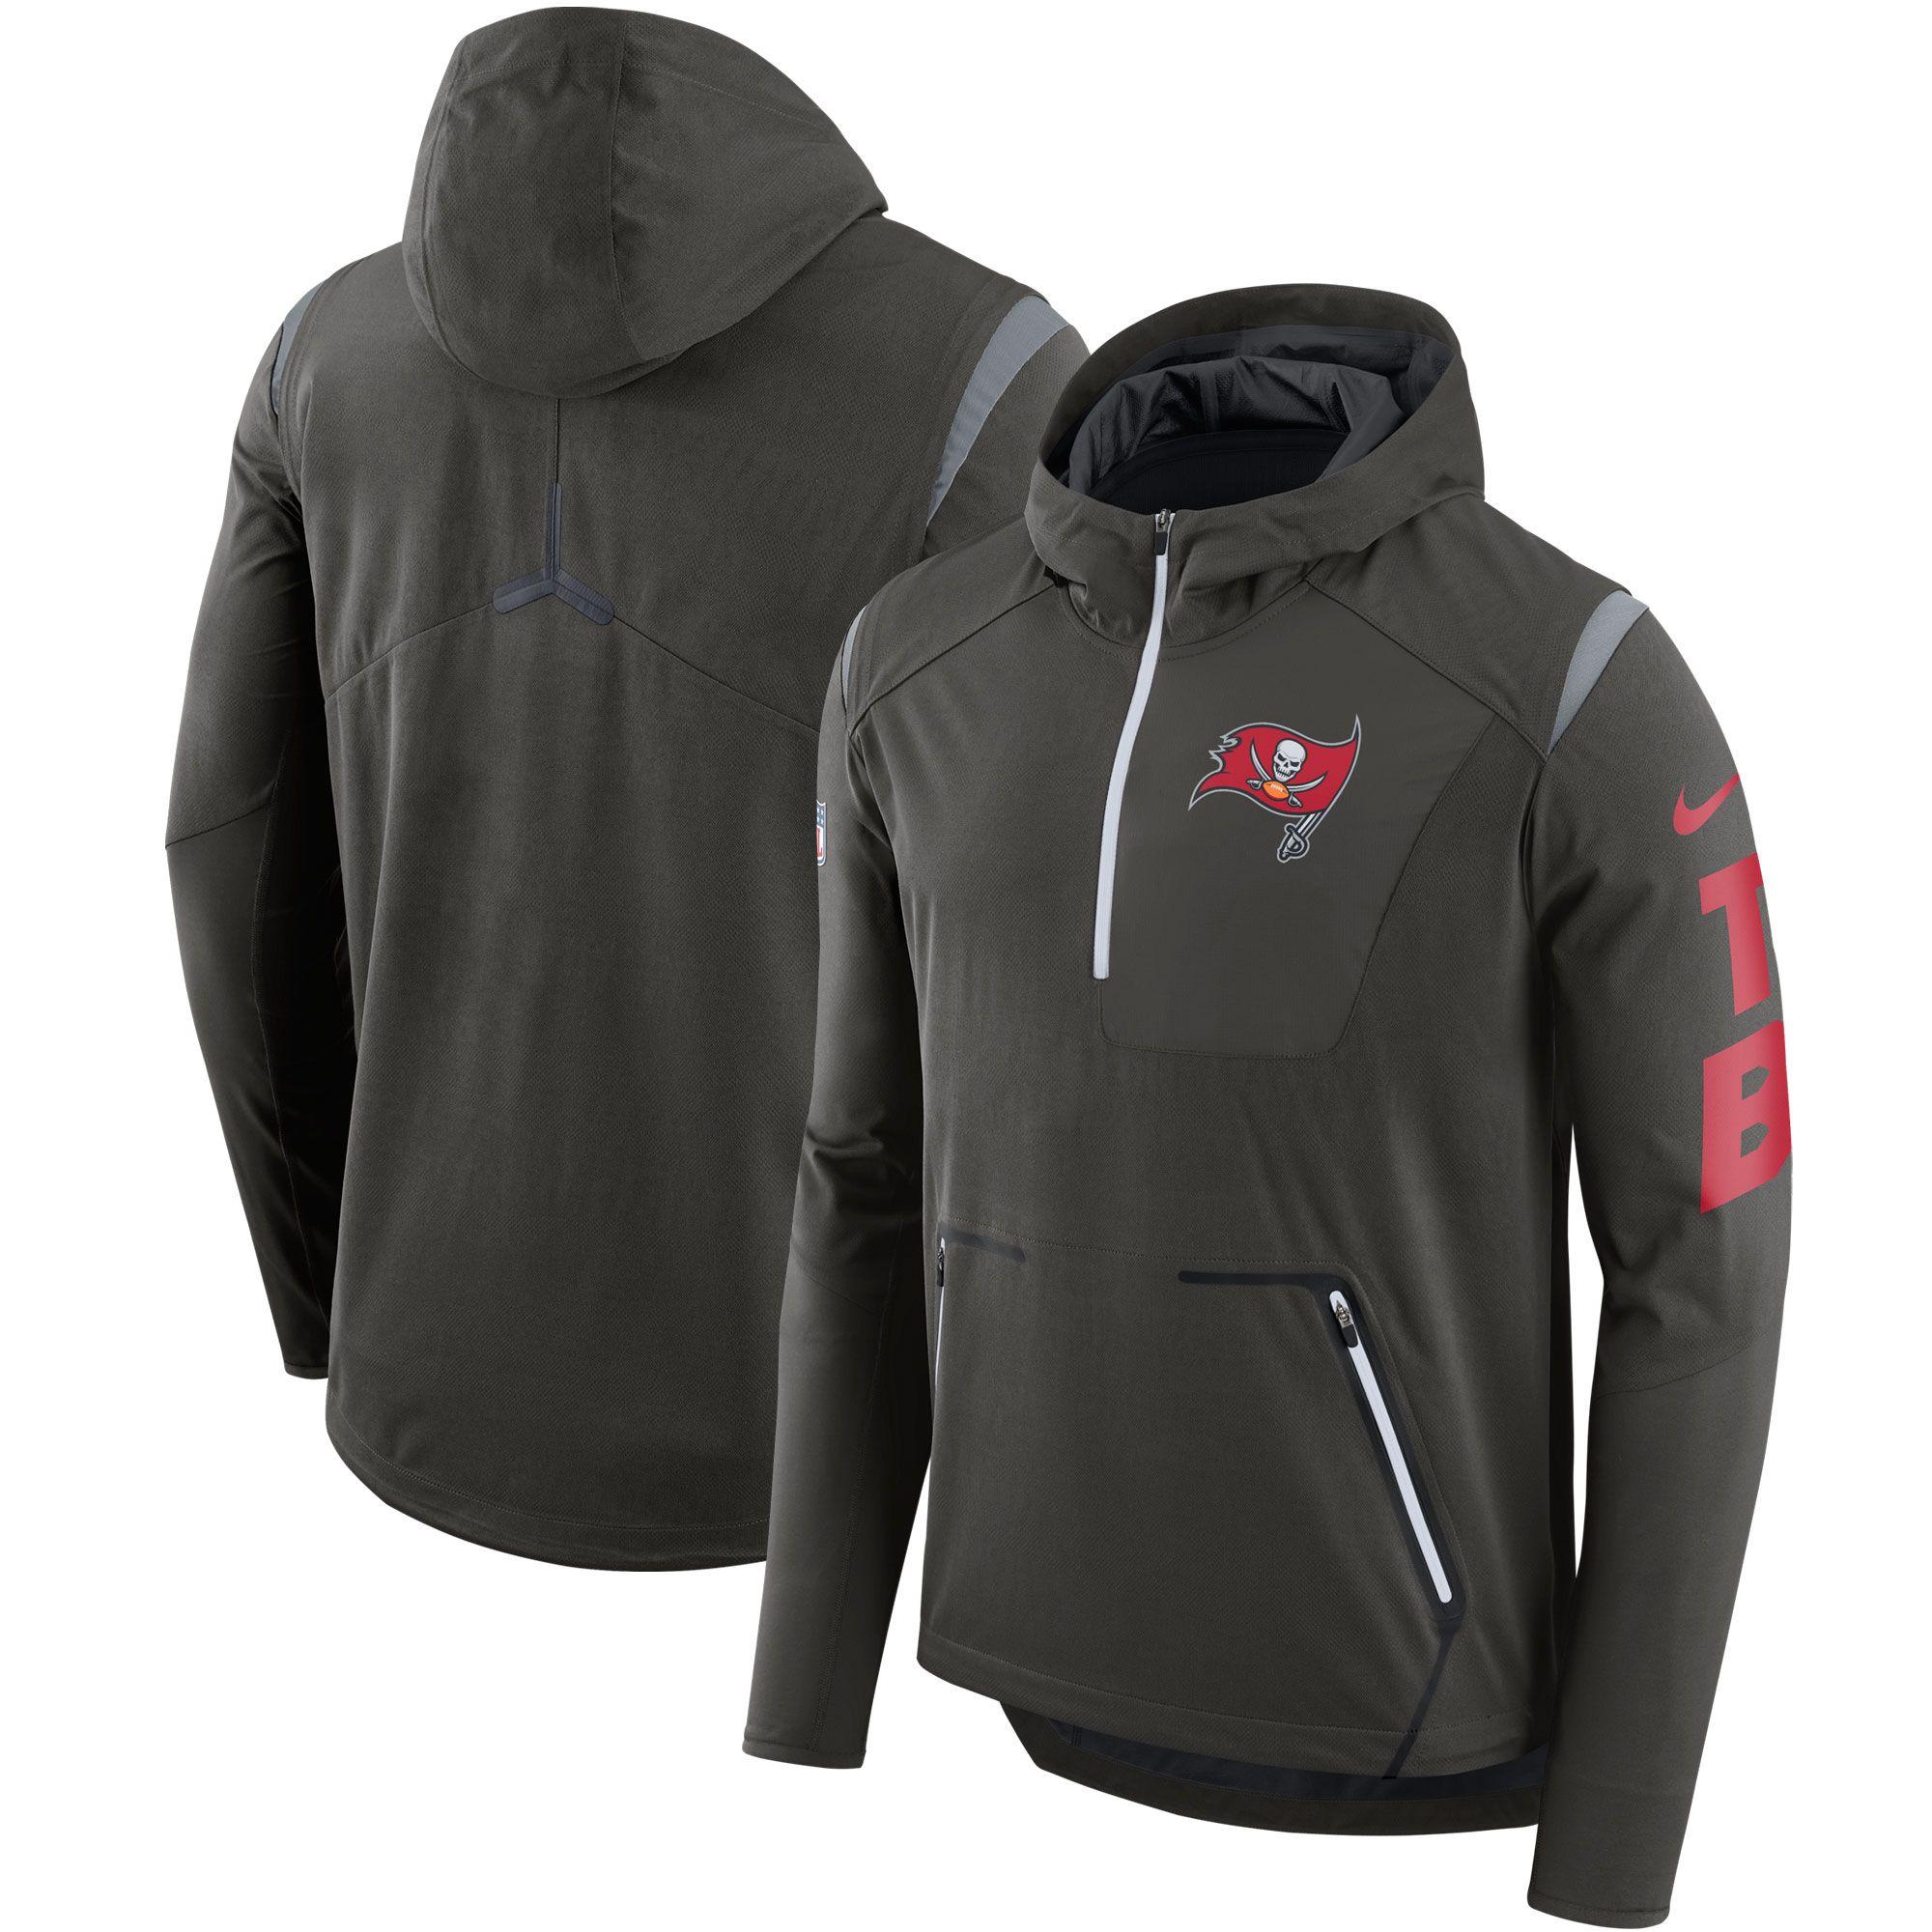 caf7a79b393e TCU Horned Frogs Nike Sideline Vapor Fly Rush Half-Zip Pullover Jacket -  Black